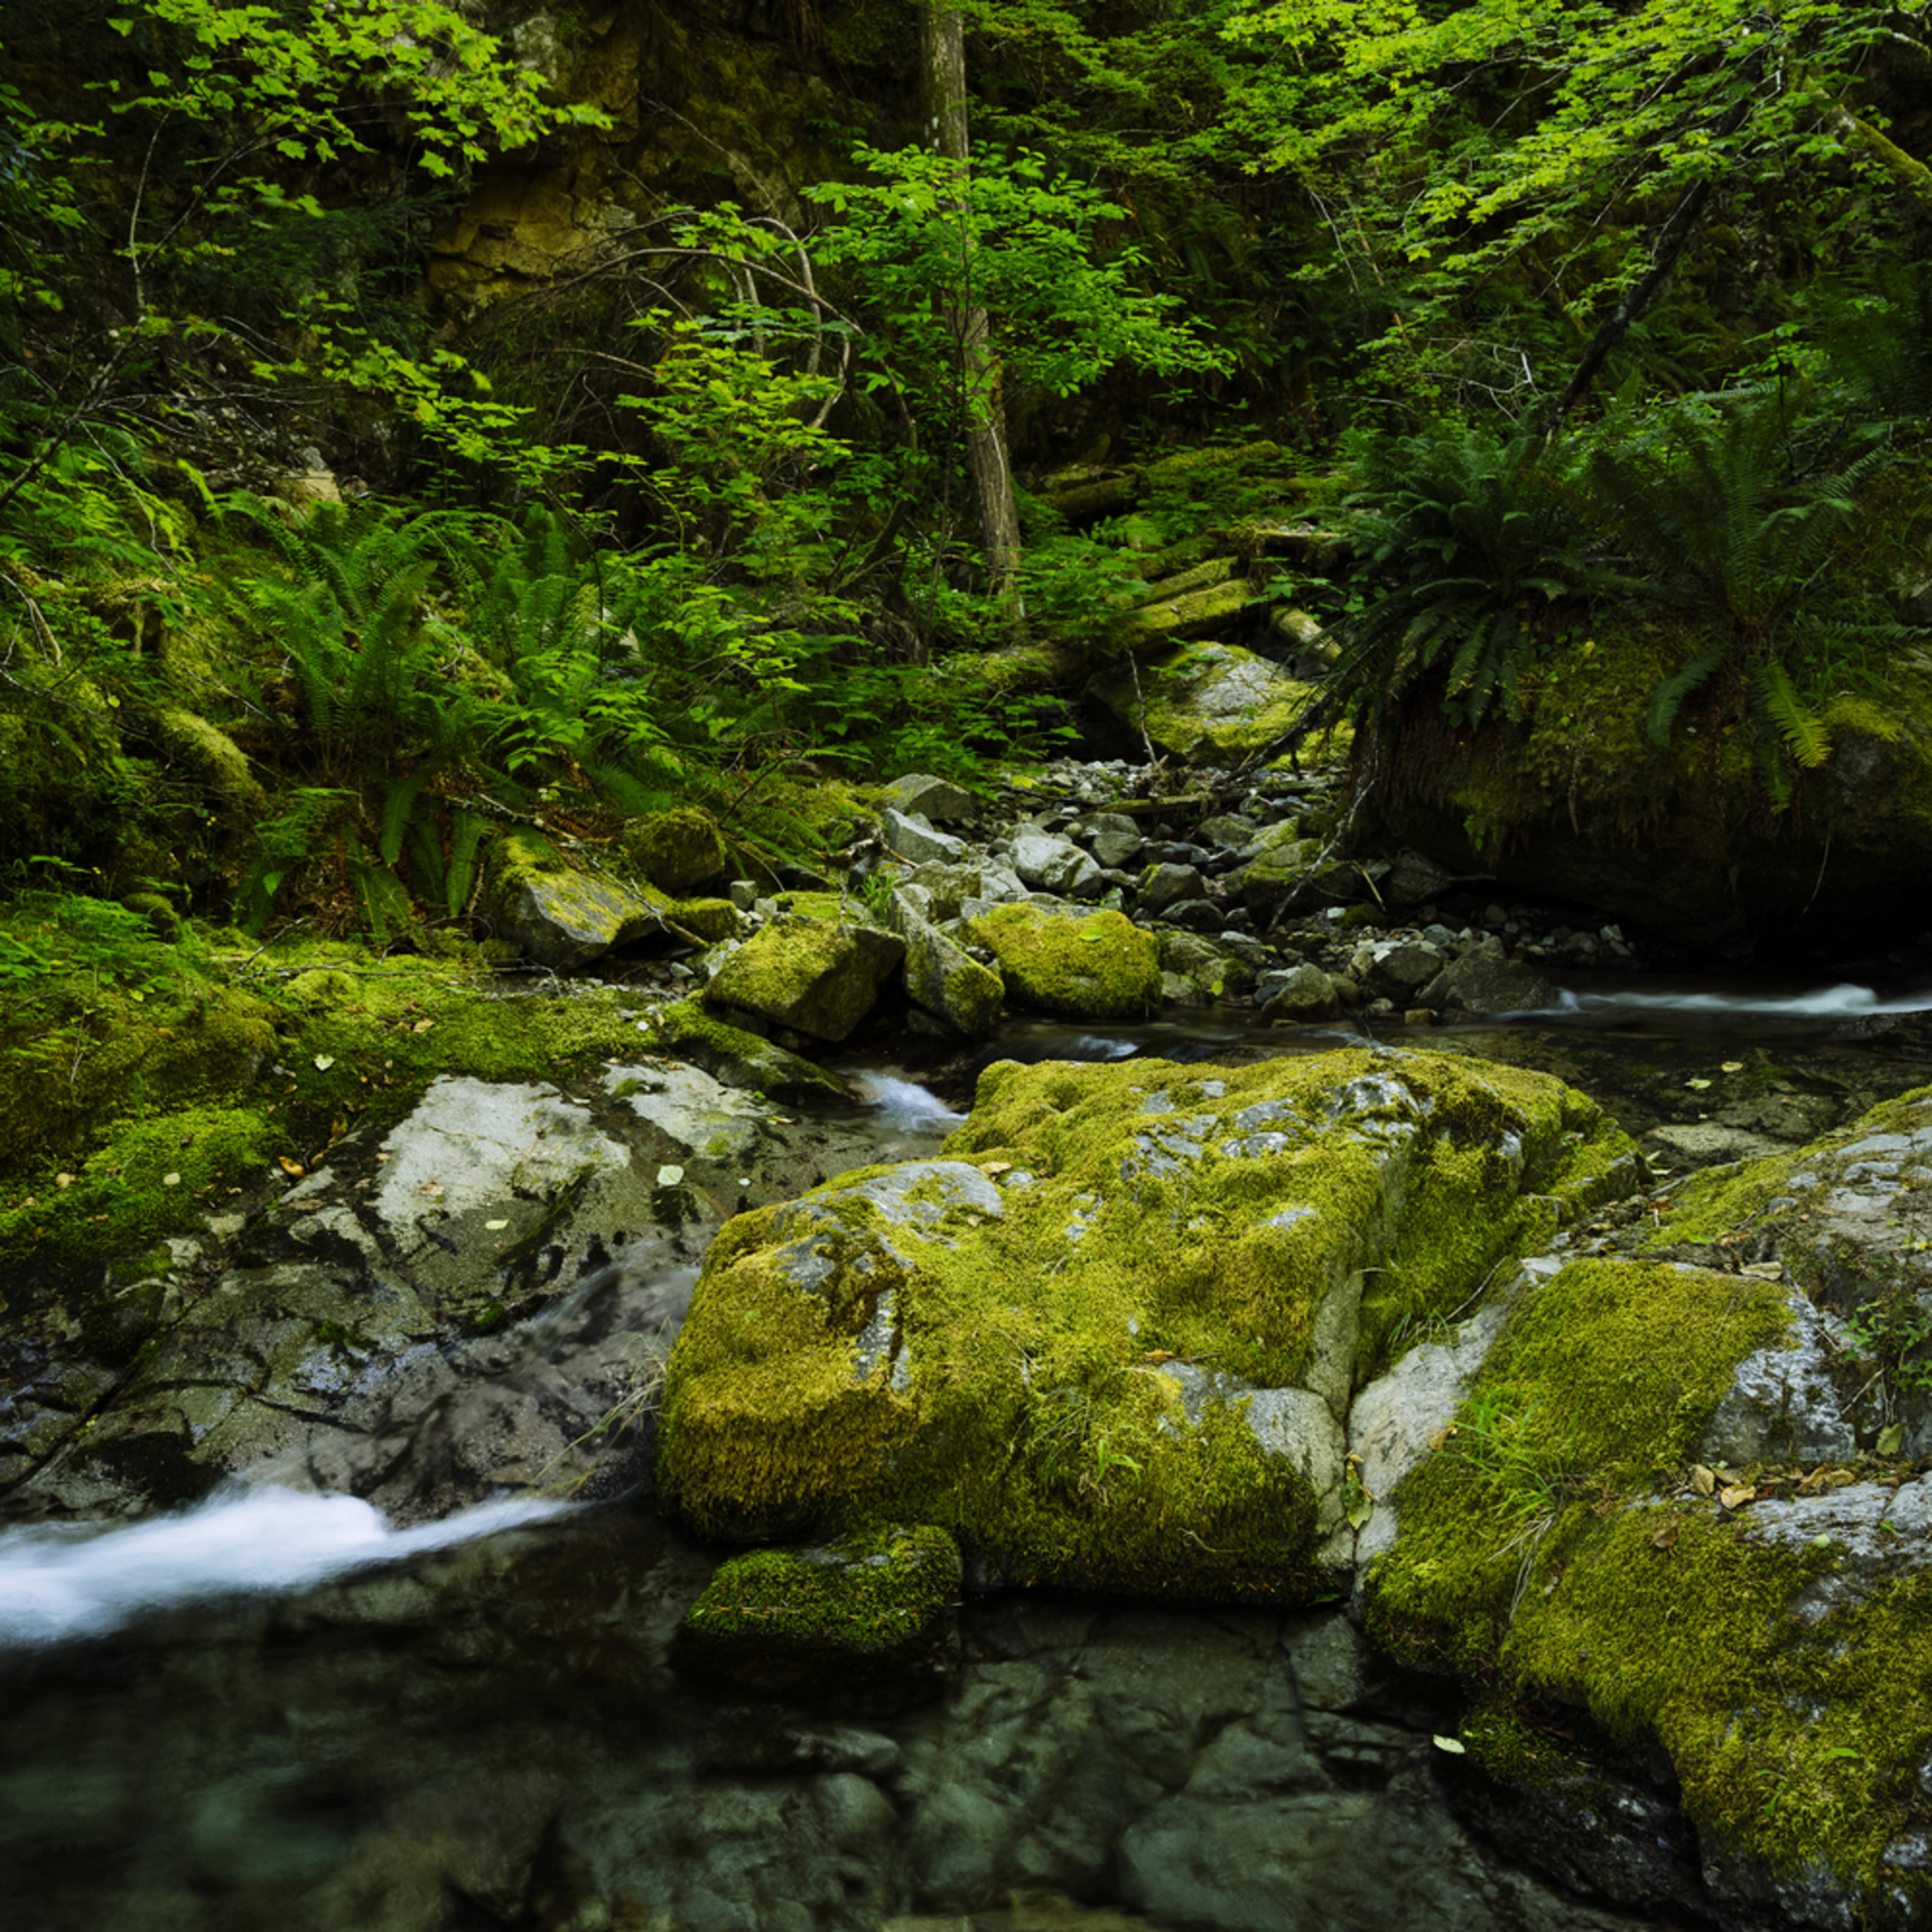 Galena creek washington 2020 b5nbll